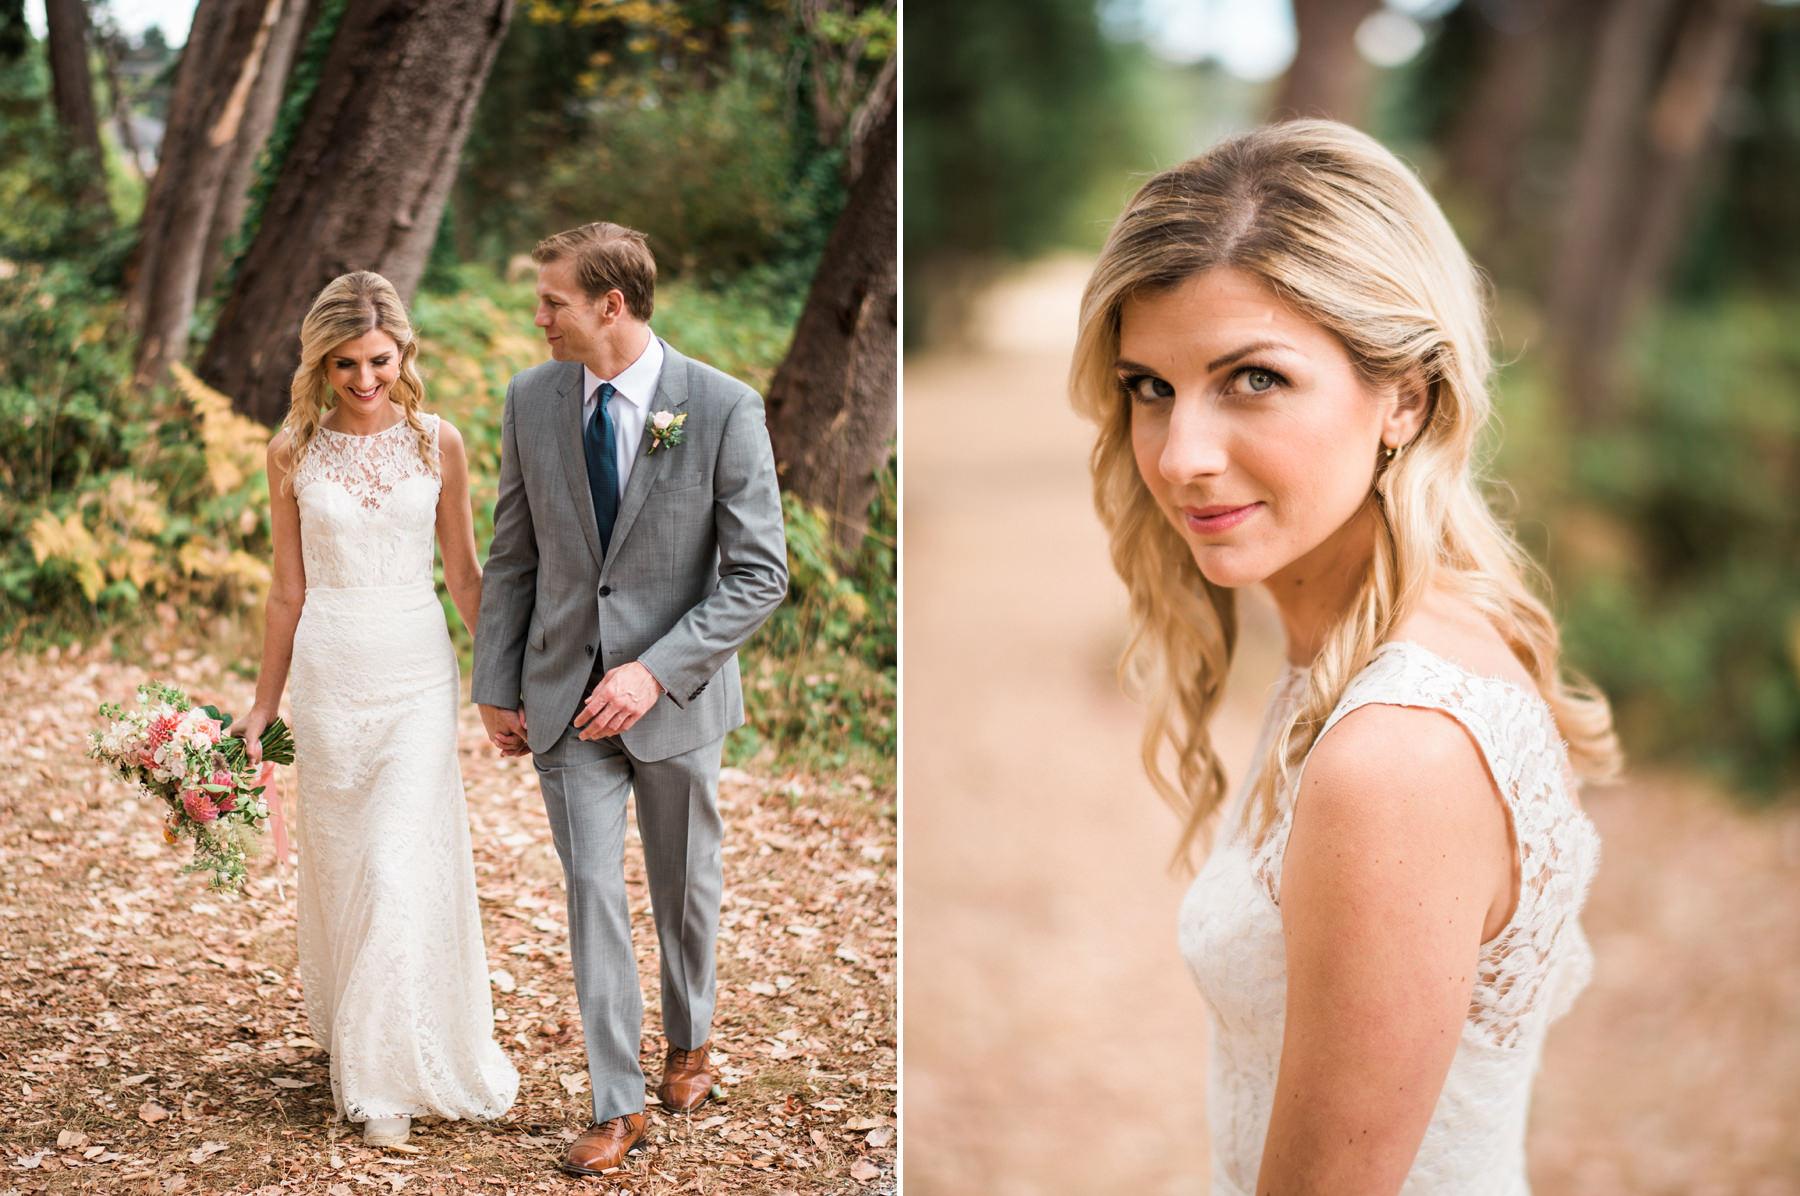 186-fine-art-wedding-portraits-on-kodak-film-at-lincoln-park-in-west-seattle.jpg